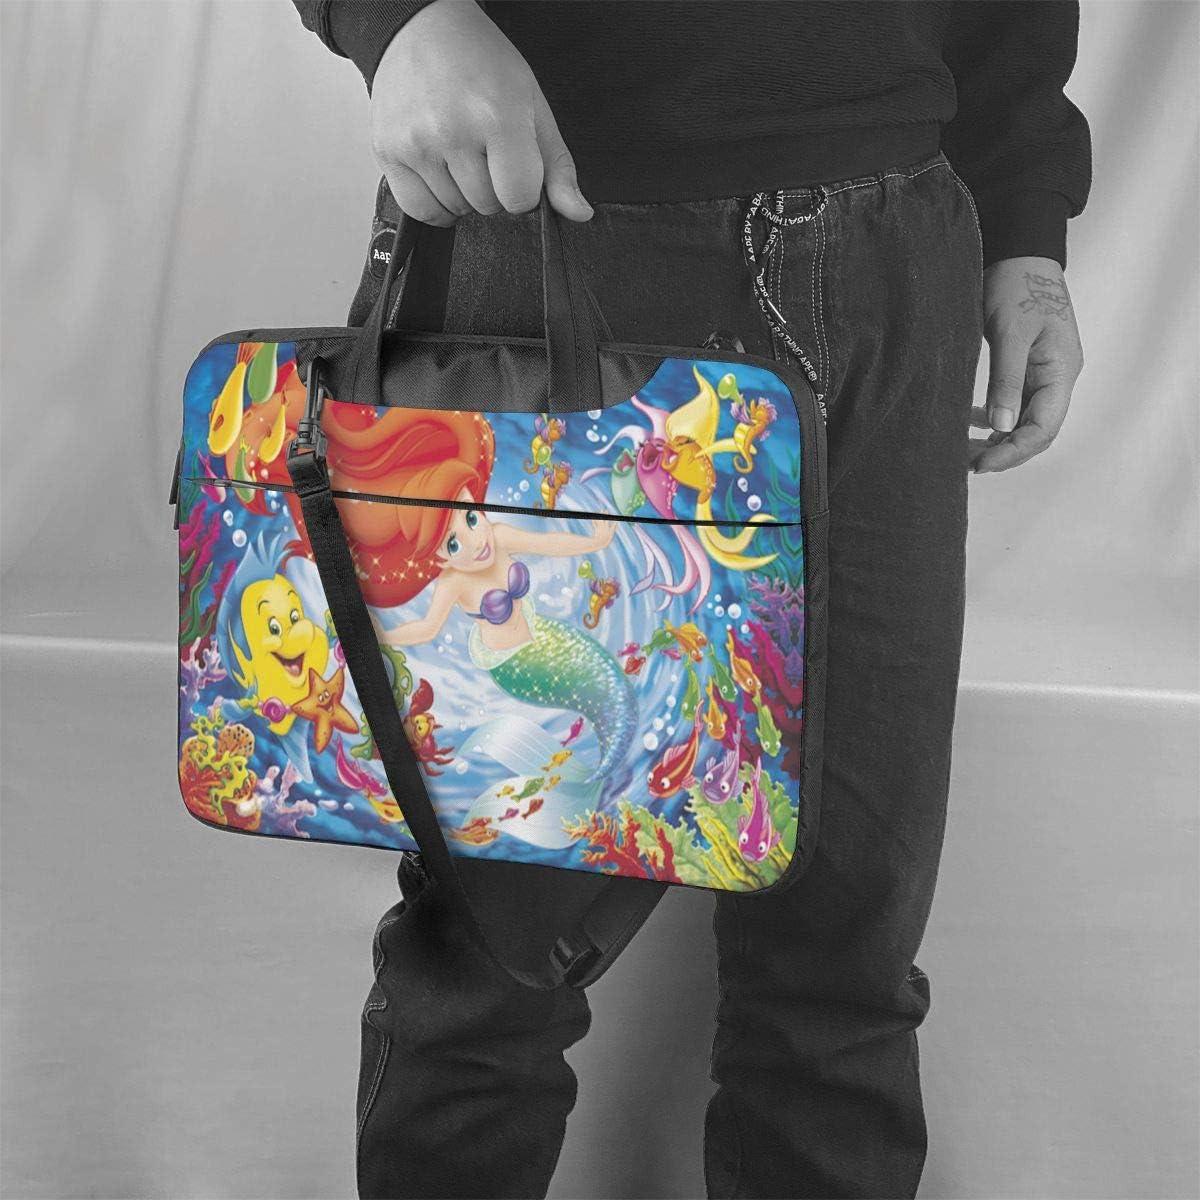 Little Mermaid Laptop Sleeve Case Handheld One Shoulder Shockproof Oxford Protective Case//Notebook Computer Pocket Case//Tablet Briefcase Carrying Bag Compatible-13 inch